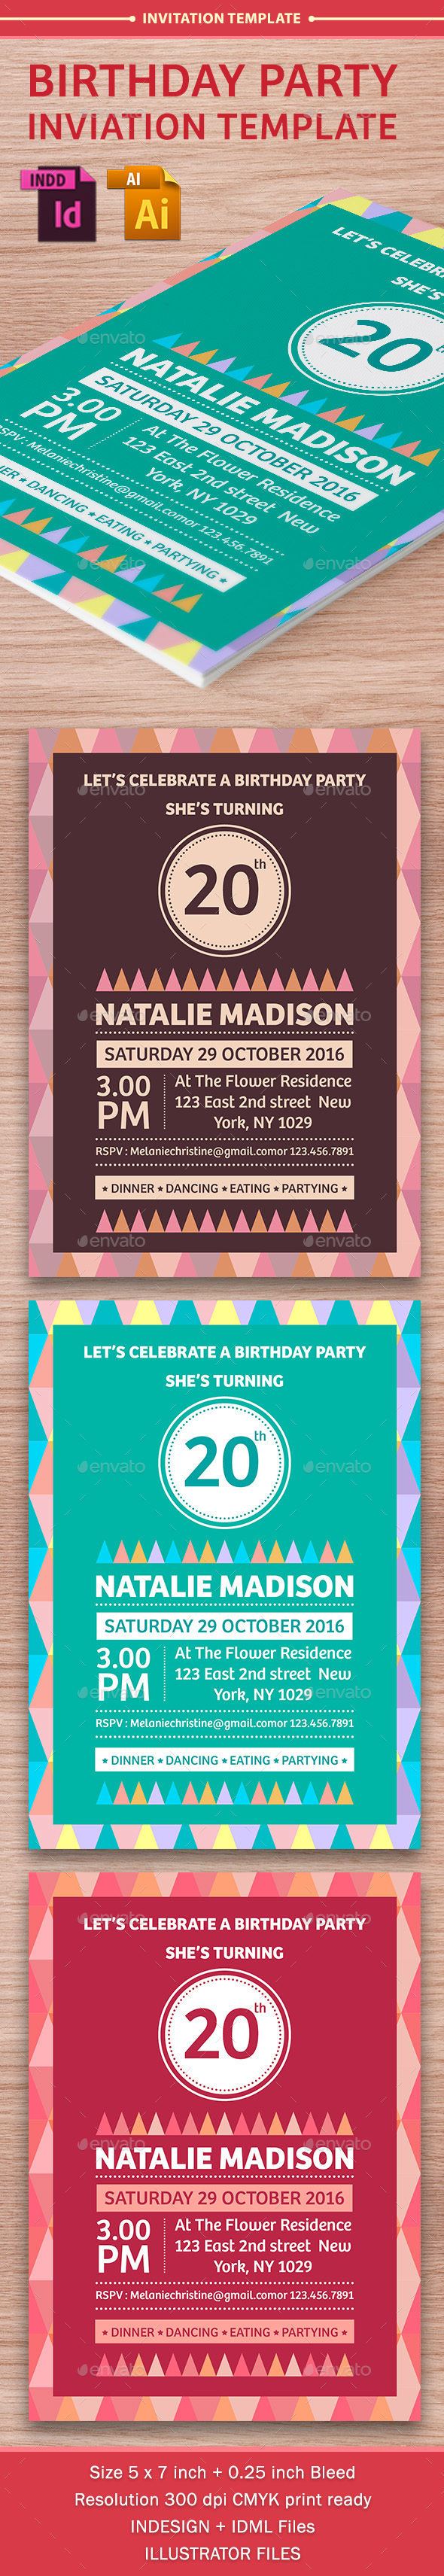 Birthday Party Invitation Template - Vol . 8 - Cards & Invites Print Templates